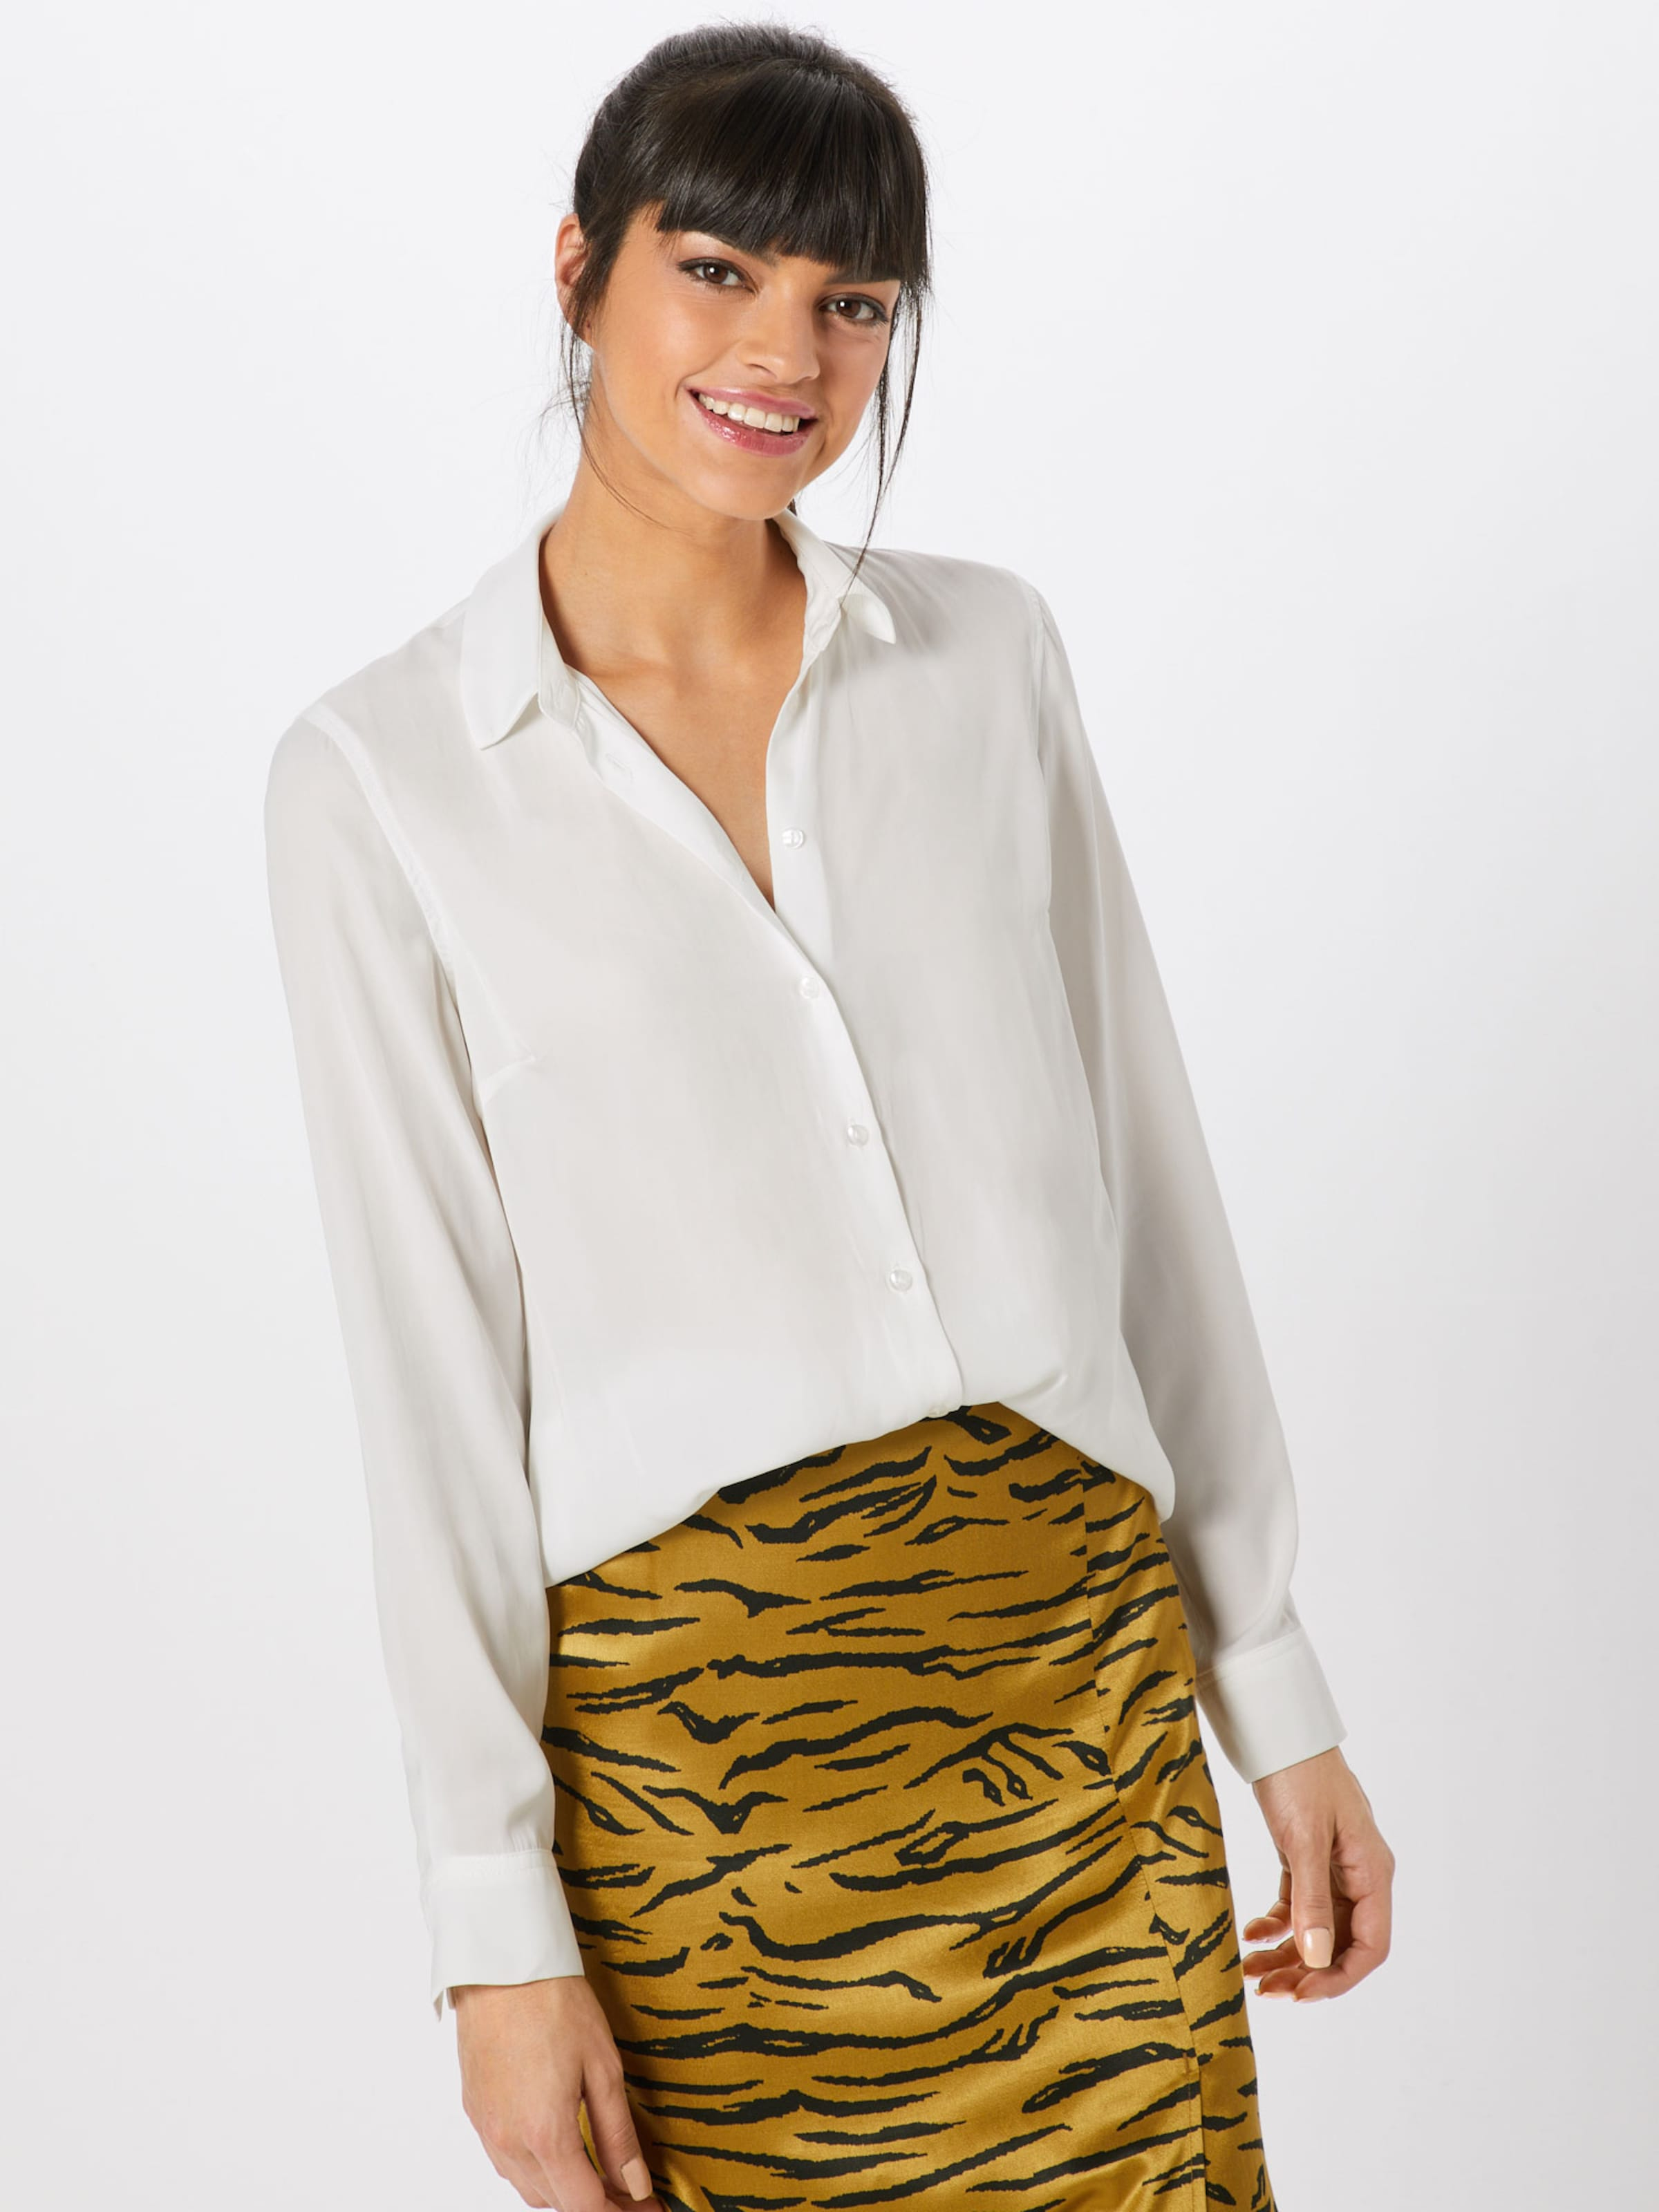 New Plain P8' Chemisier Ww Look Mattie Satin Blanc Ls '01 Shirt En 06 T rBEdoQeCxW